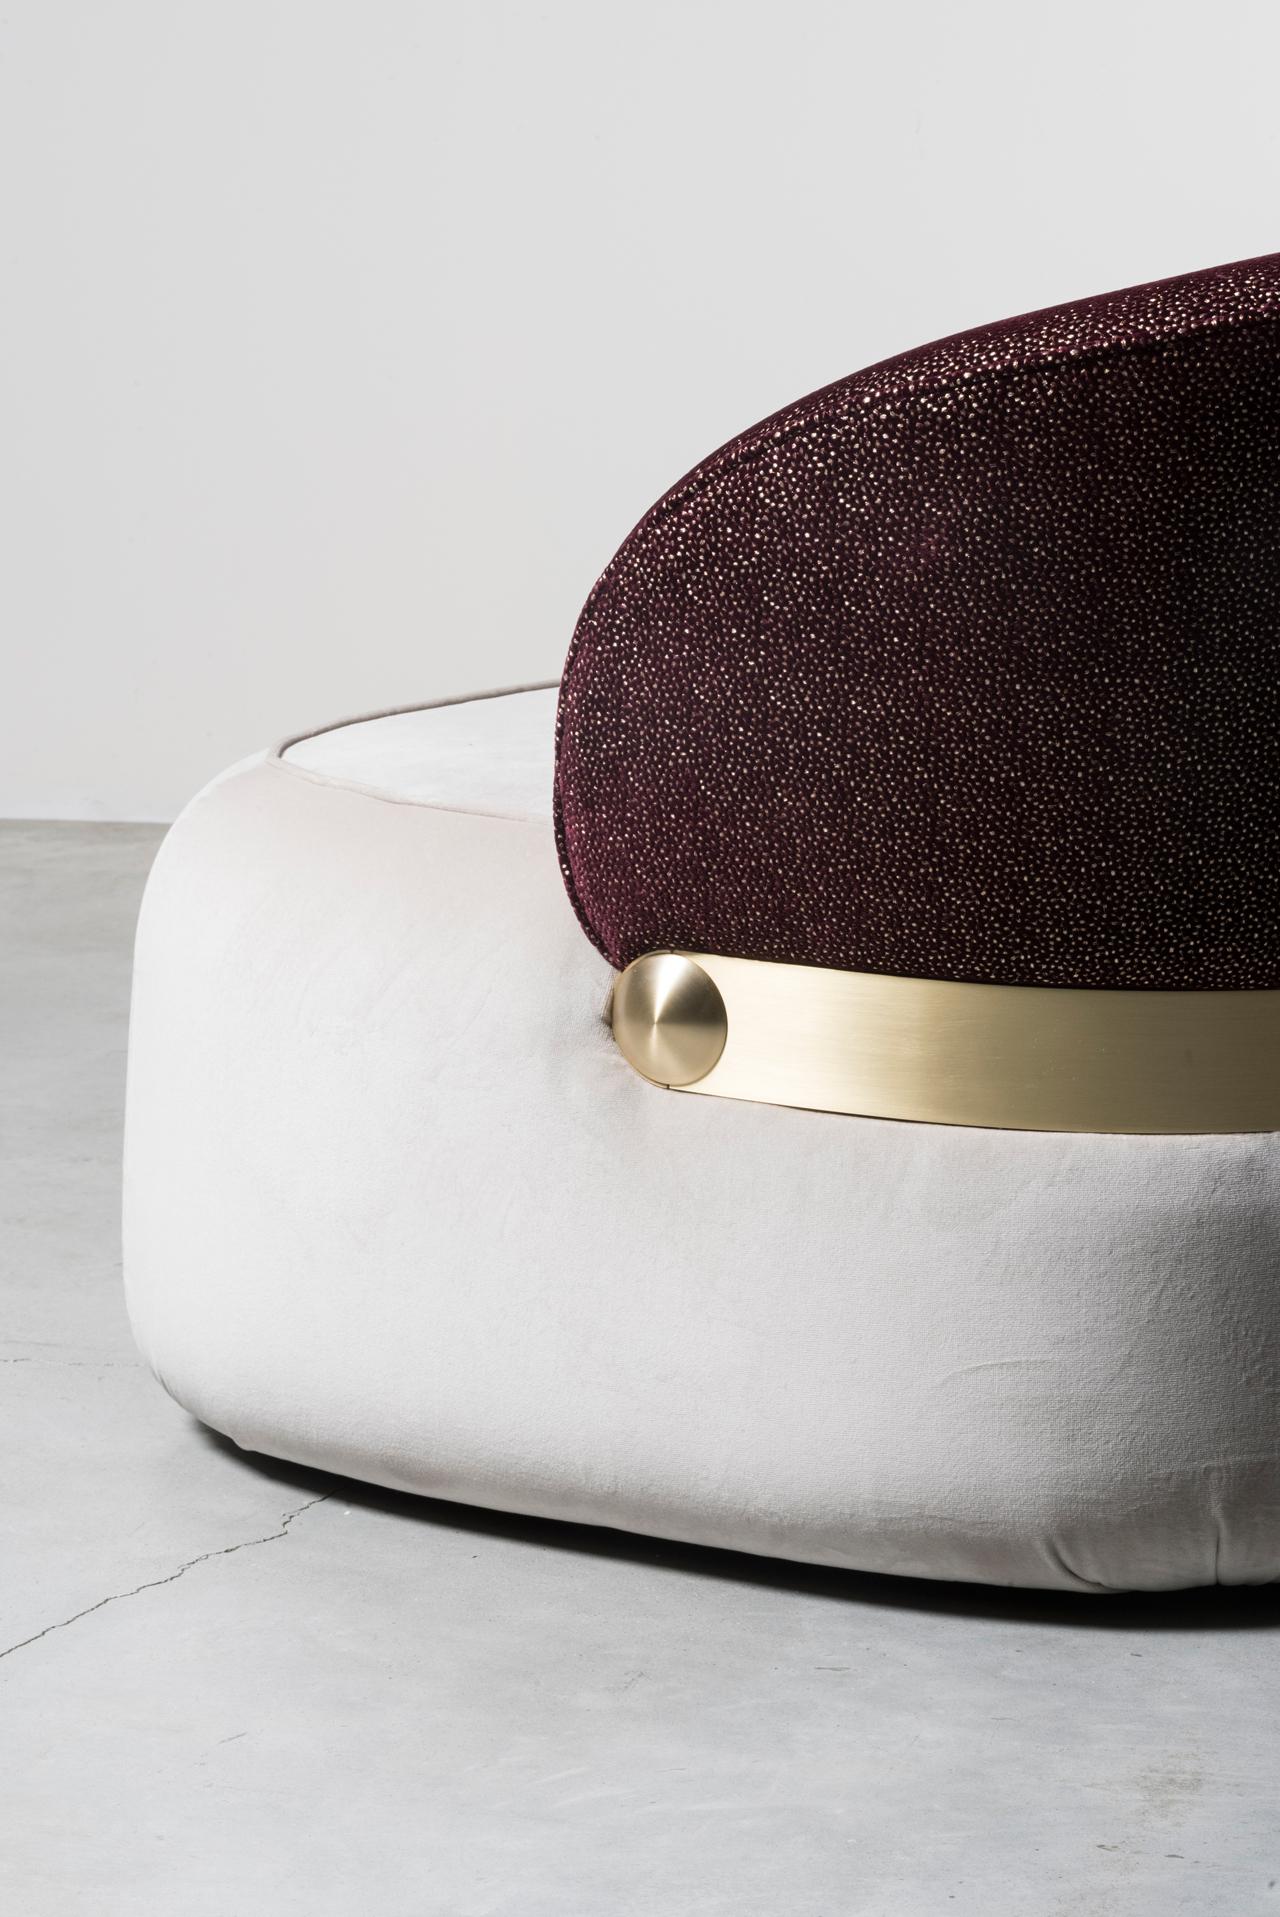 Visiera sofa (detail) by Cristina Celestino for Nilufar gallery. Photo©Daniele Iodice.